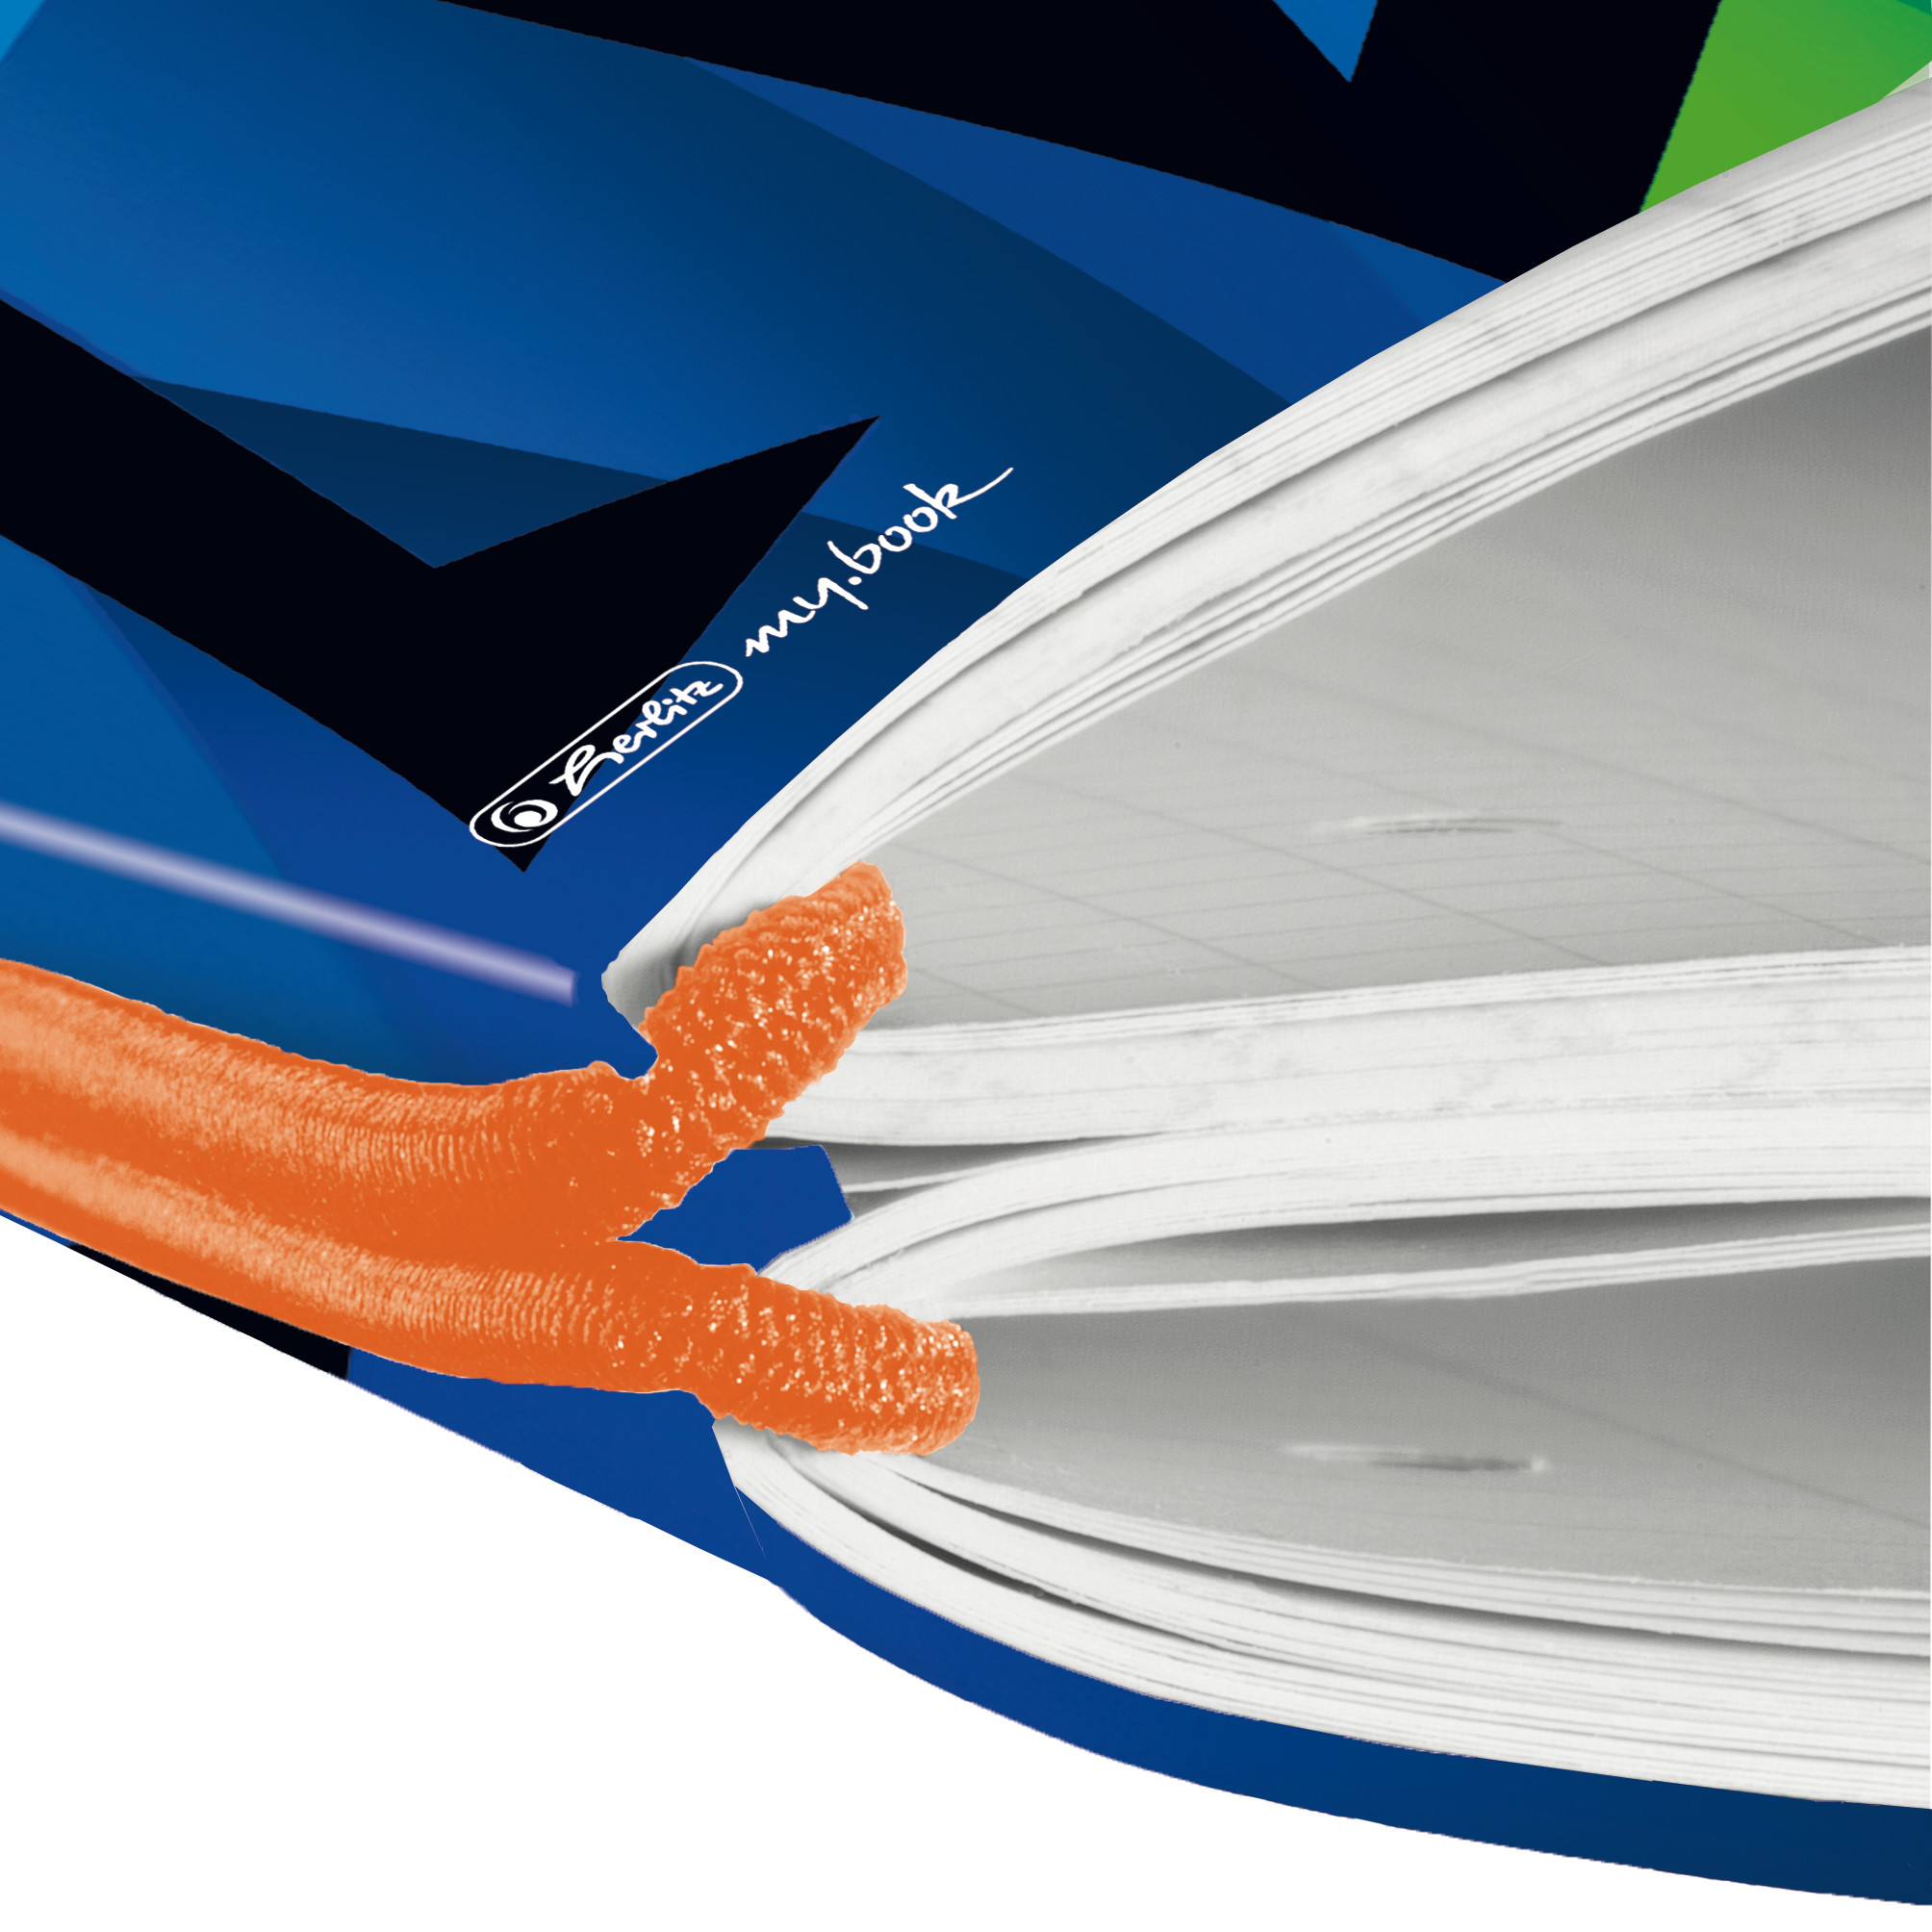 Herlitz Neon Art - Muster - Mehrfarbig - A4 - 80 Blätter - 80 g/m² - Kariertes Papier